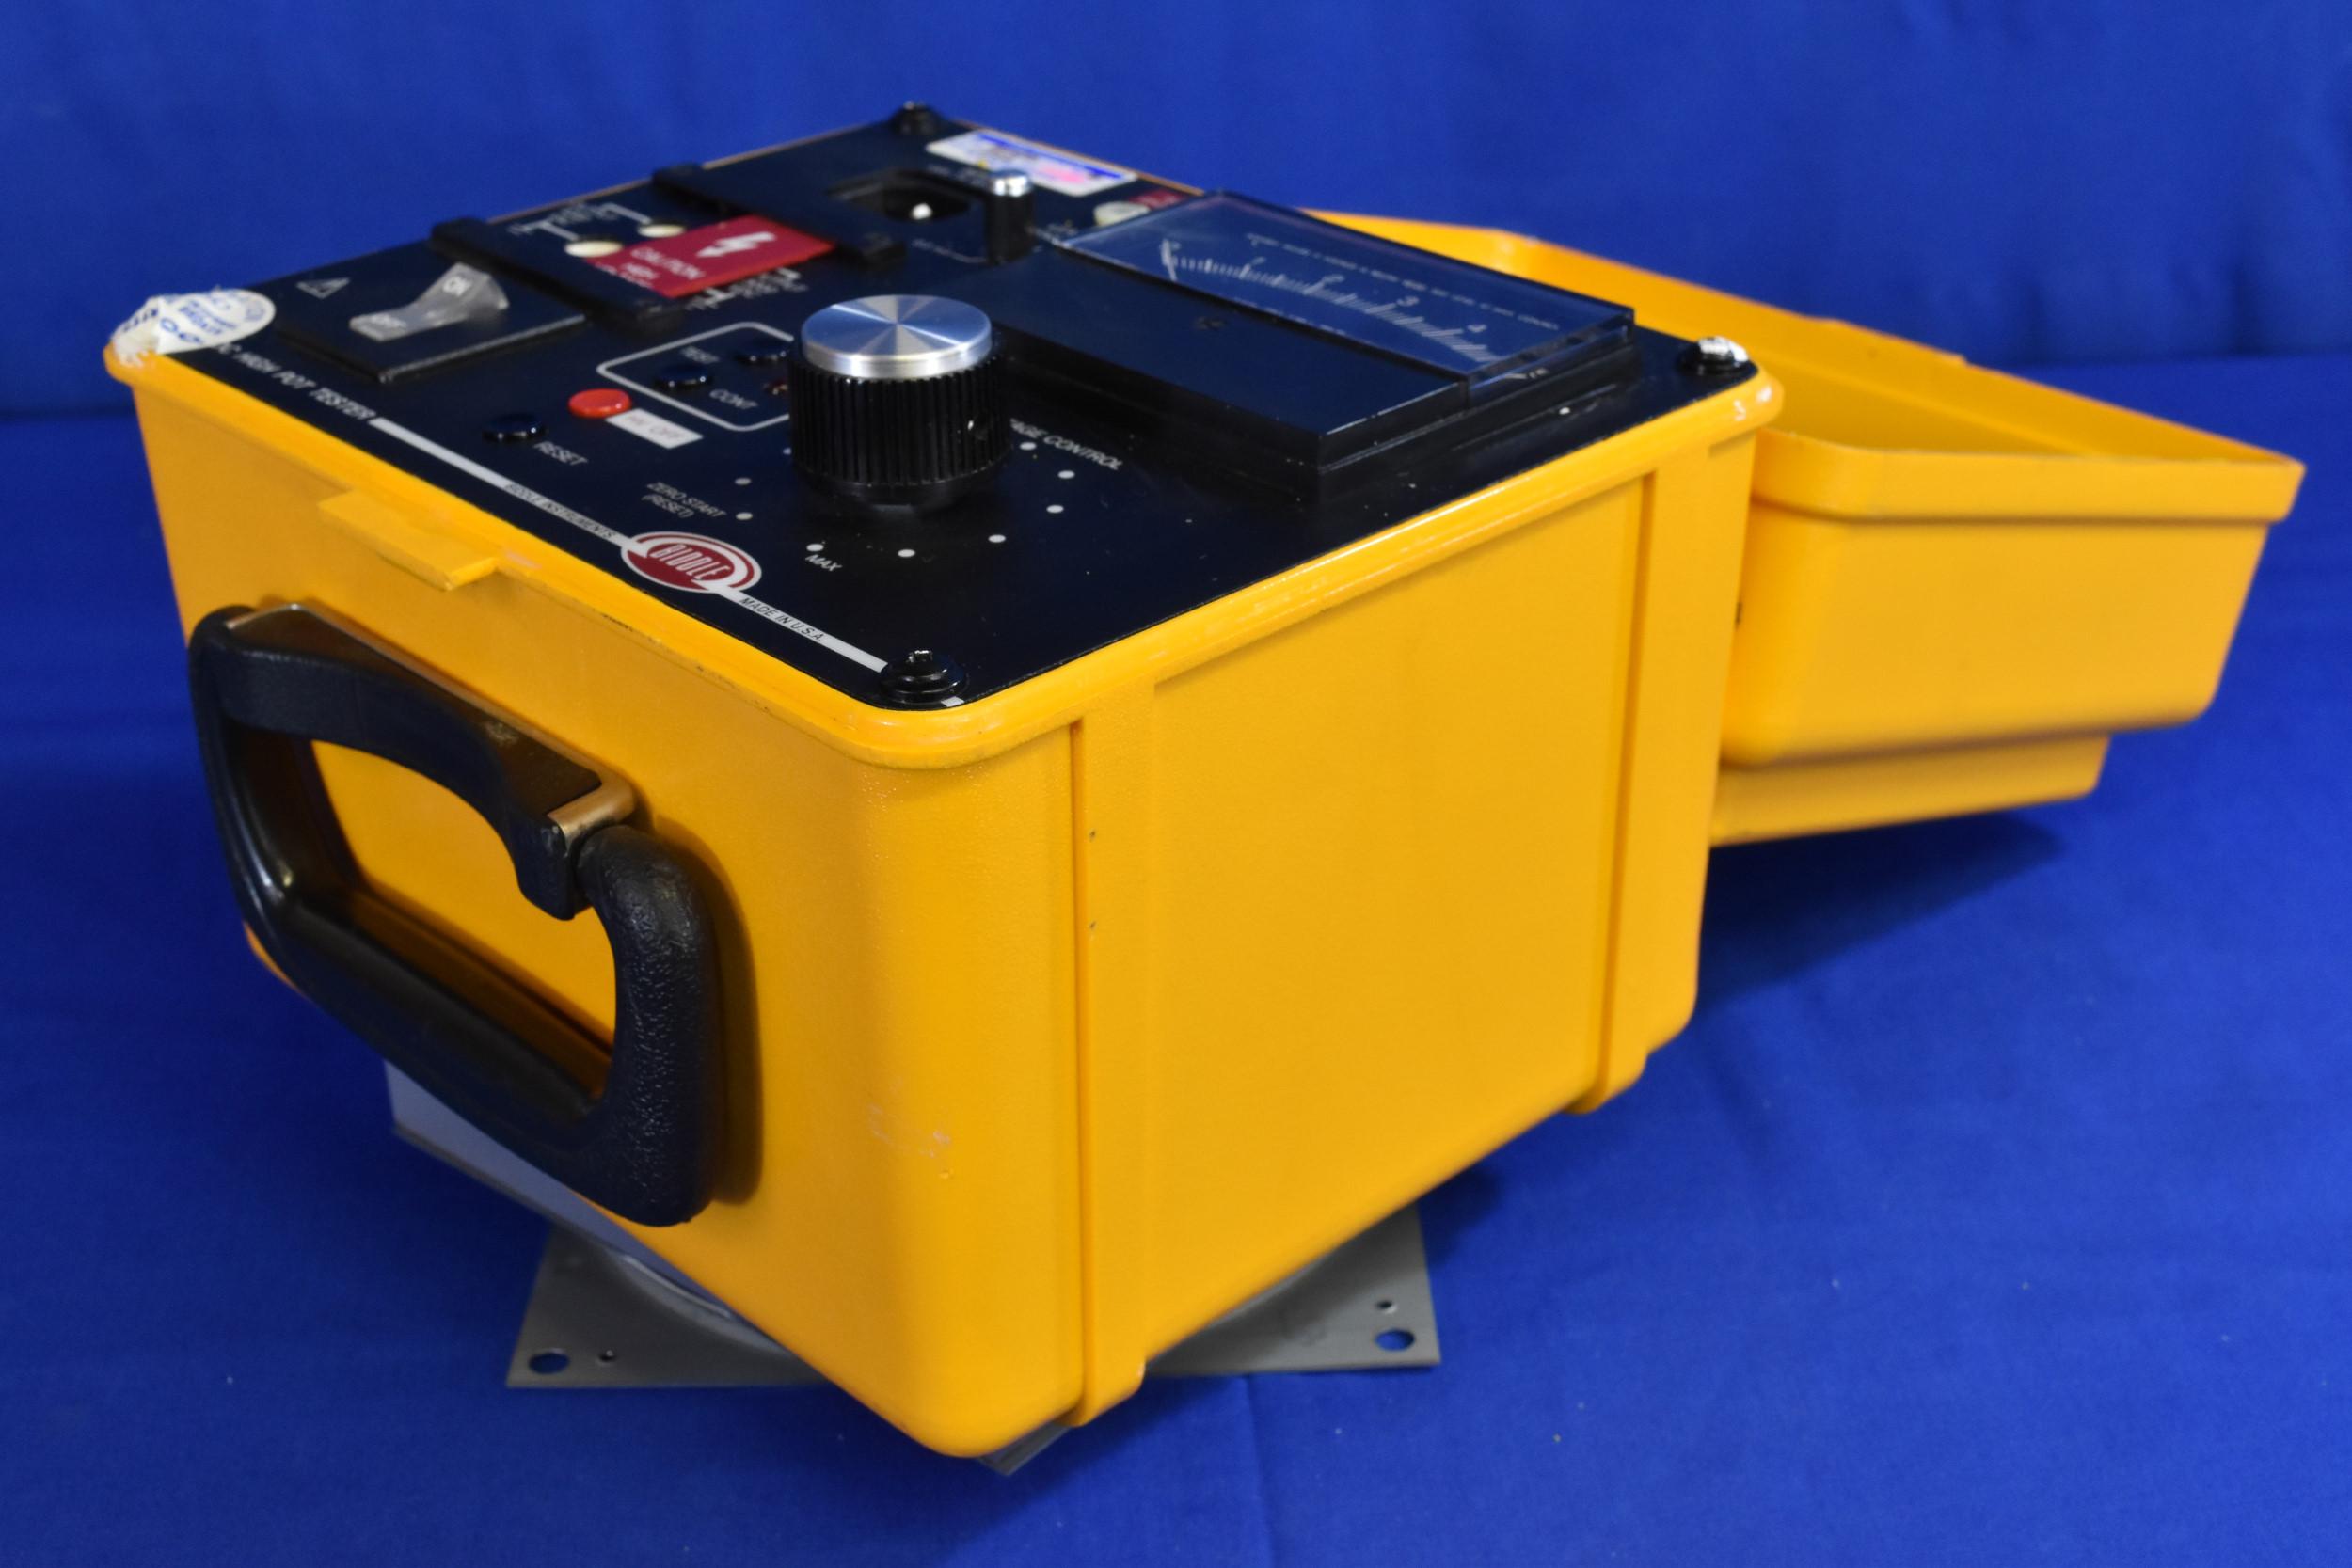 Biddle Megger 230425 Ac Dc High Pot Tester 0 4 Kv Ac 0 5 Kv Dc Silicon Valley Test Measurement